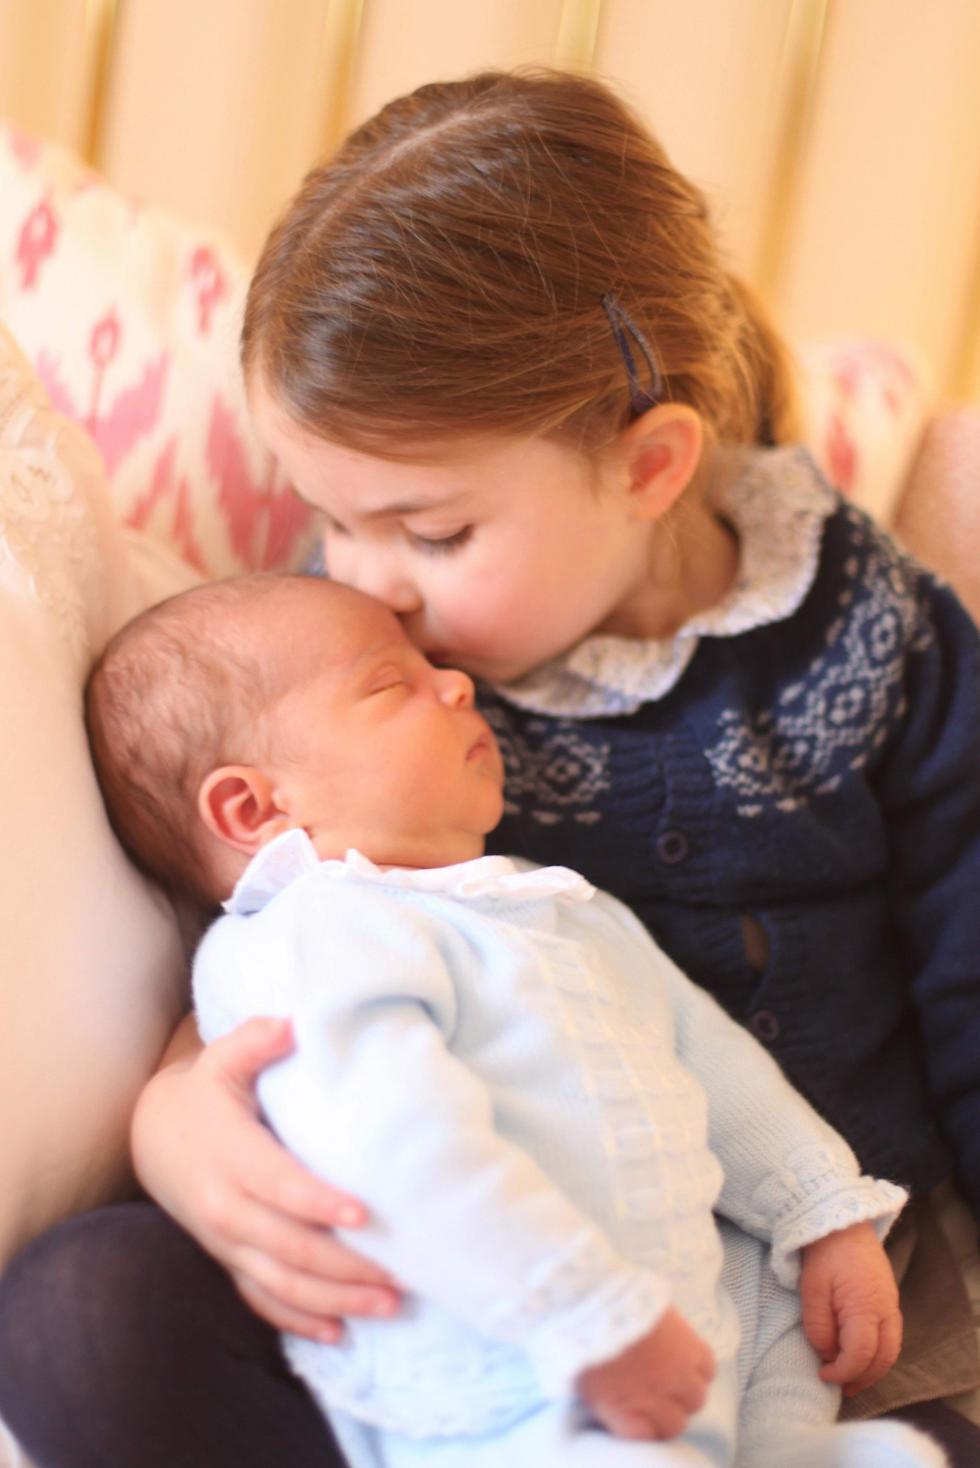 הנסיכה שרלוט עם הנסיך לואי (צילום: AFP)